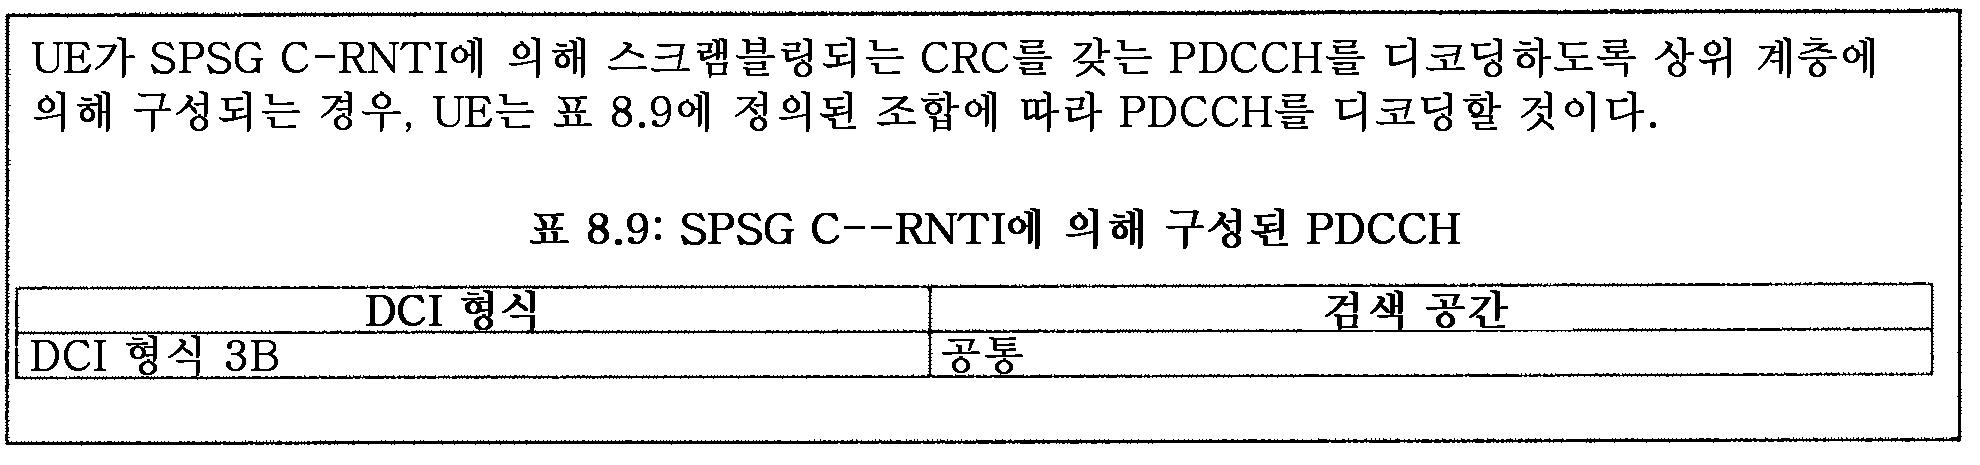 Figure 112017009934131-pat00004